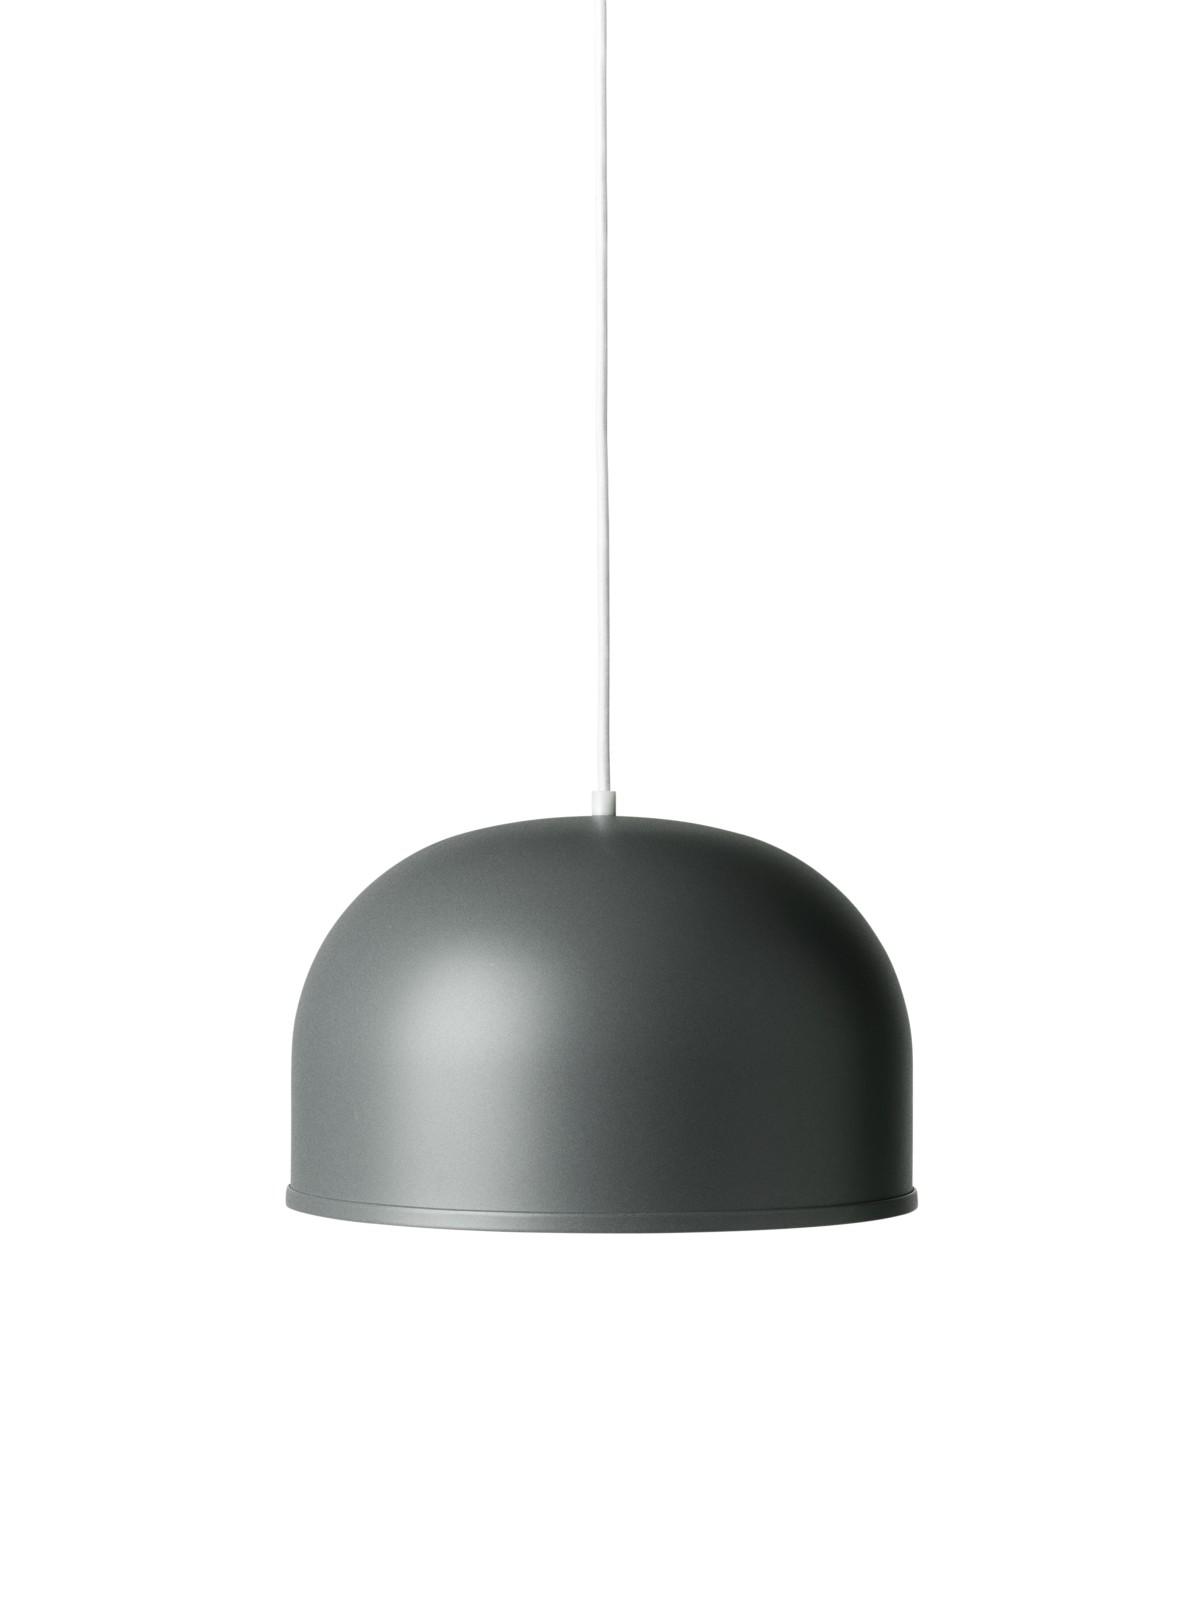 Gm 30 Pendant Light Basalt Grey